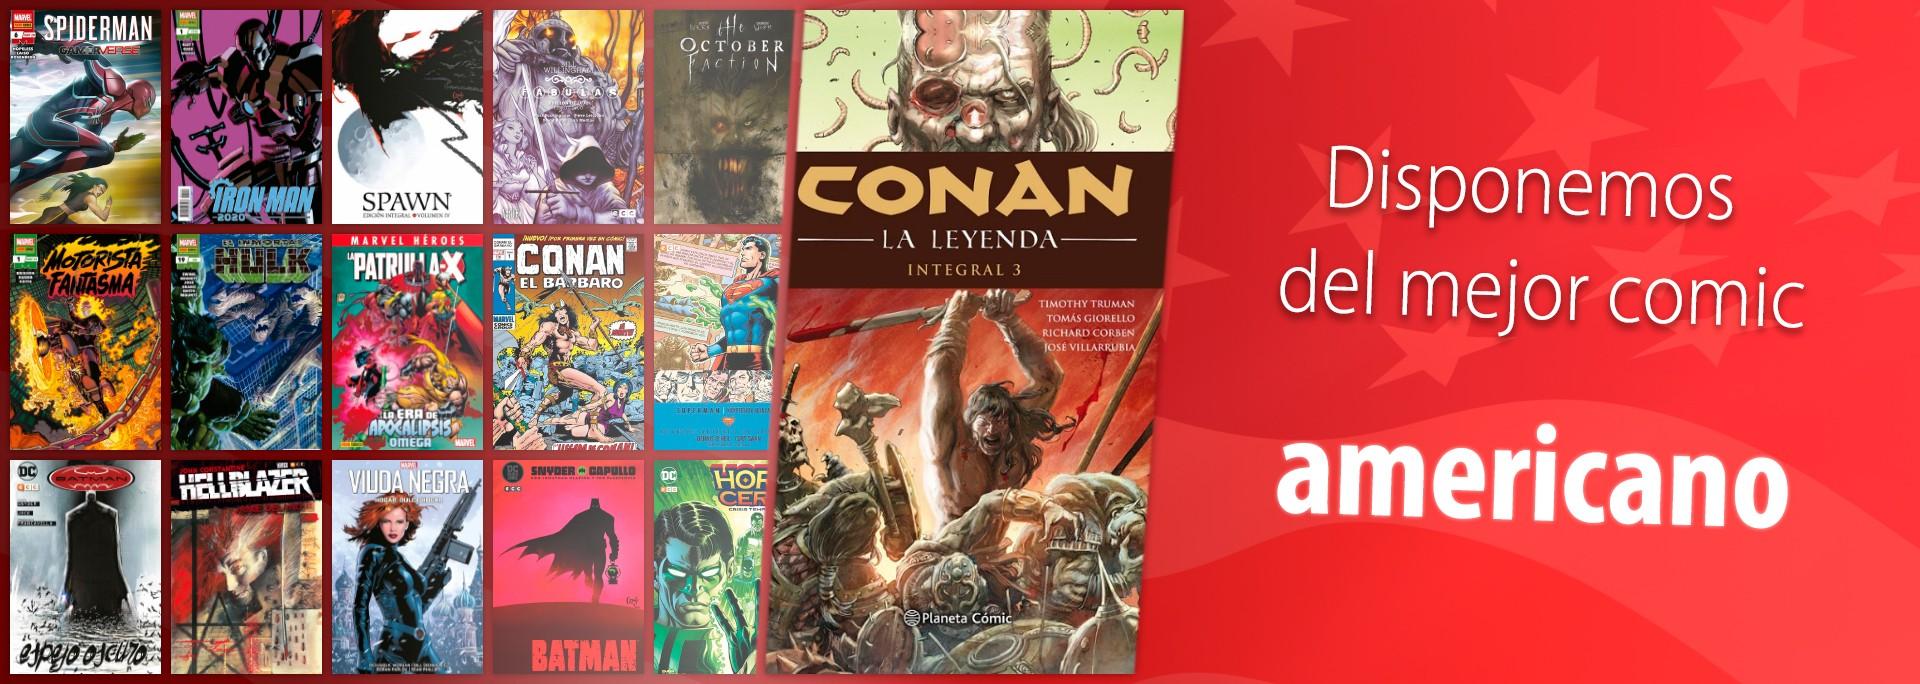 ComicSpain.com - Disponemos del mejor comic americano